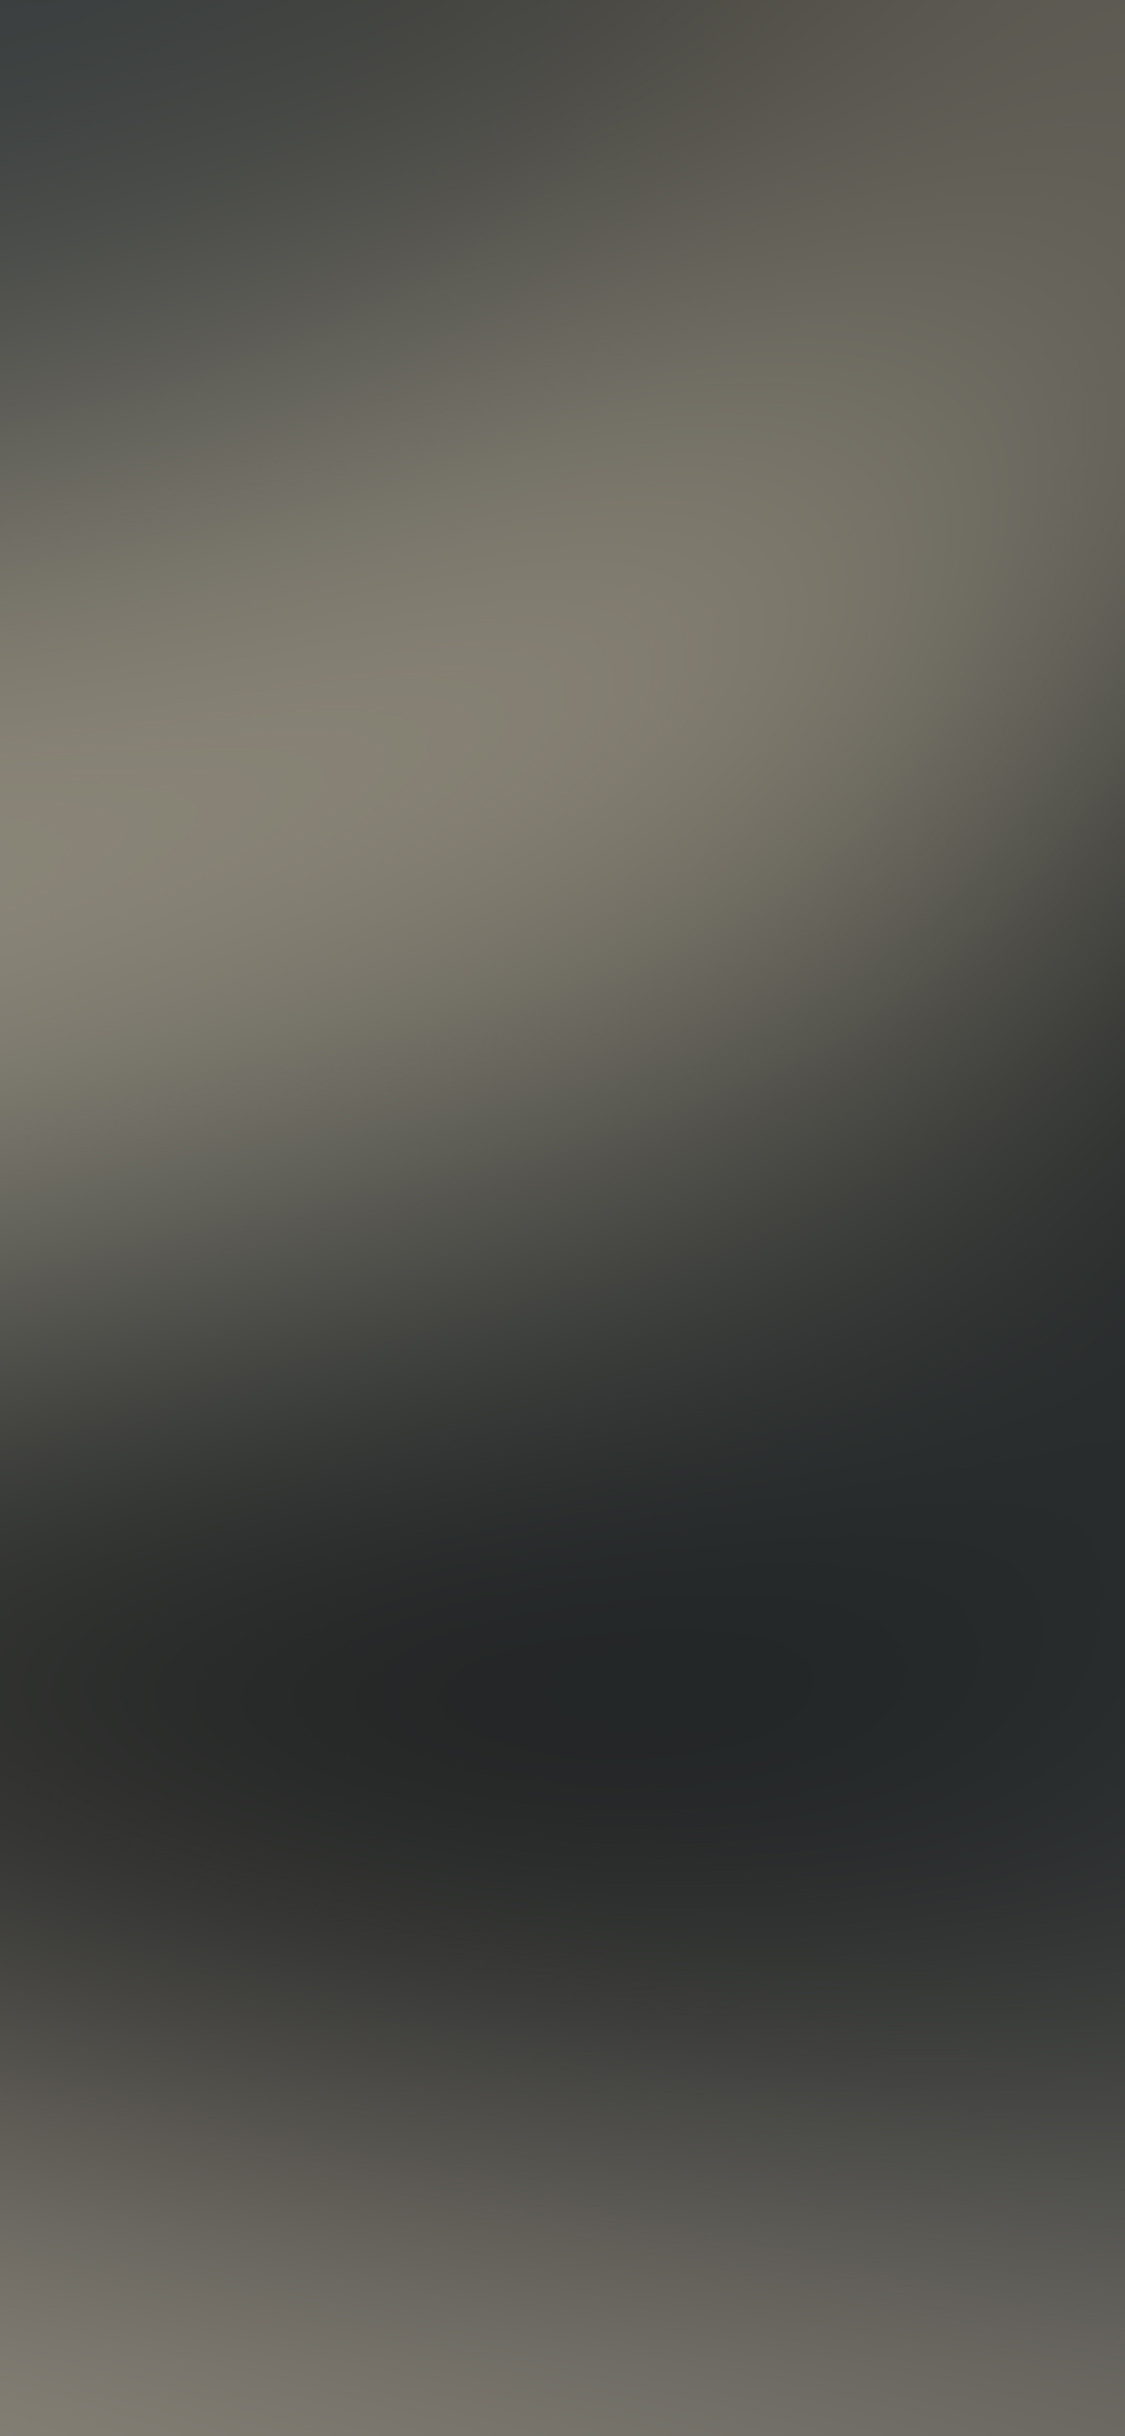 Com Apple Iphone Wallpaper Sj61 Gray Dark Gradation Dark Gray Iphone X 2599154 Hd Wallpaper Backgrounds Download